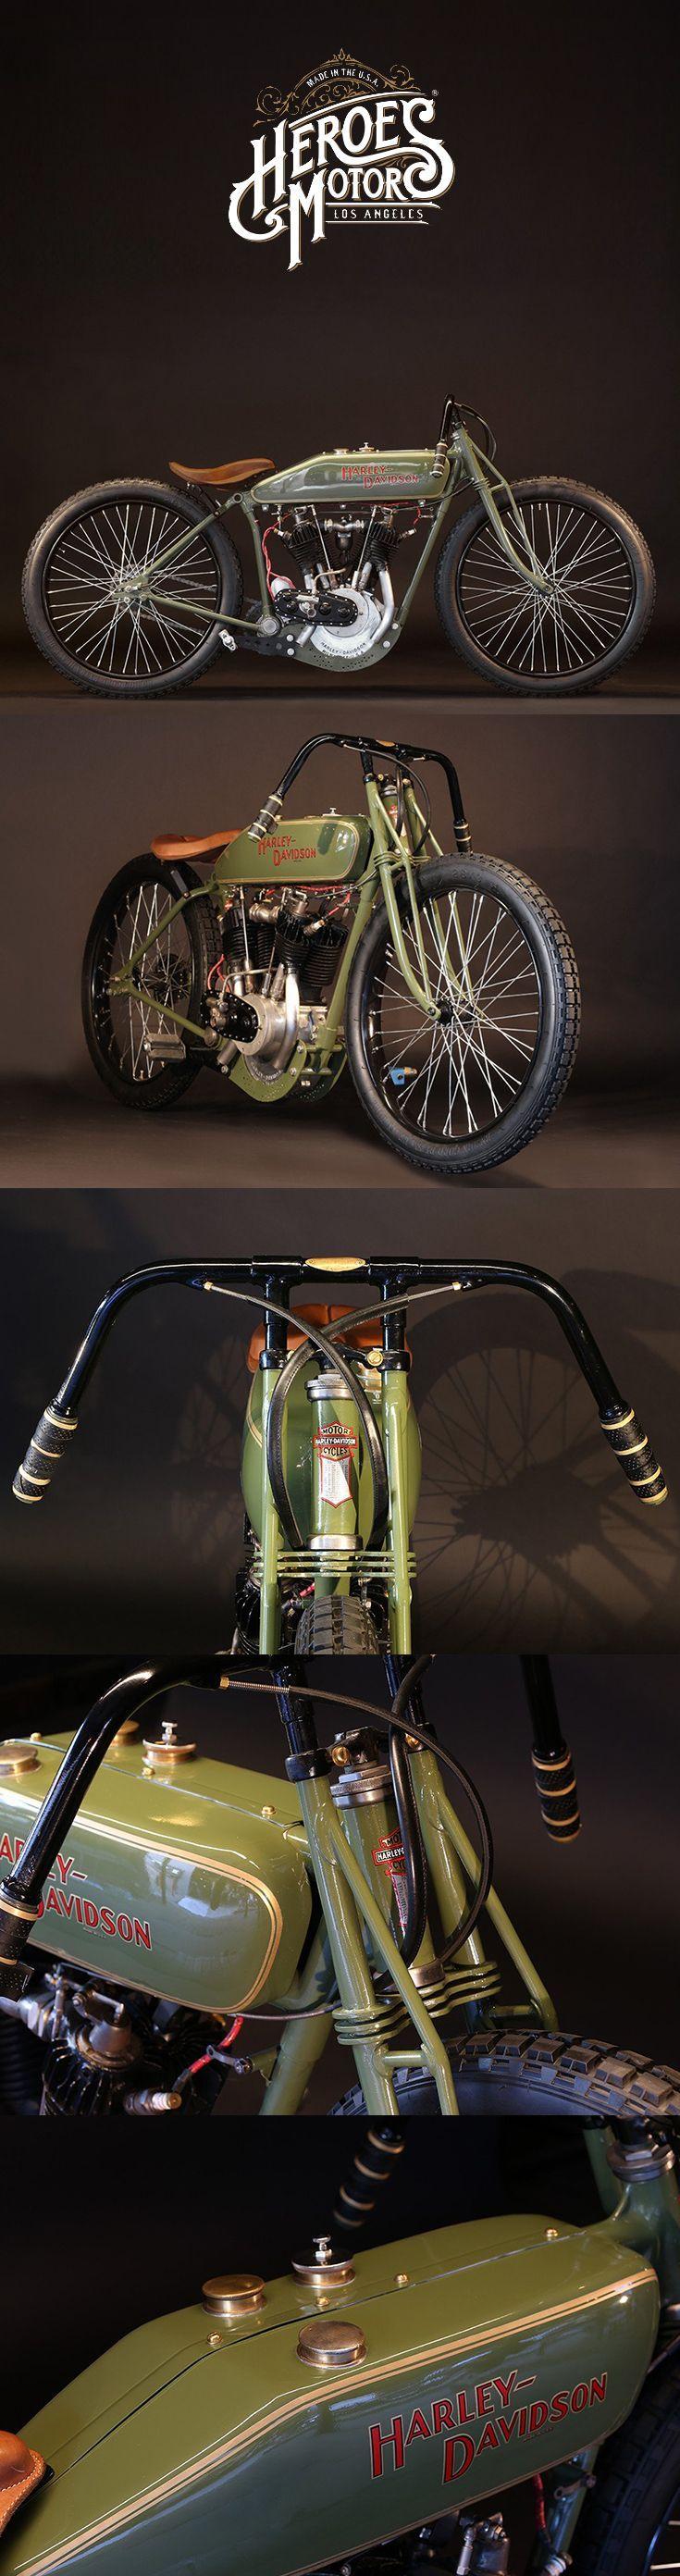 1920 Harley Davidson Board Track Racer Harley Davidson Bikes Vintage Motorcycles Classic Bikes